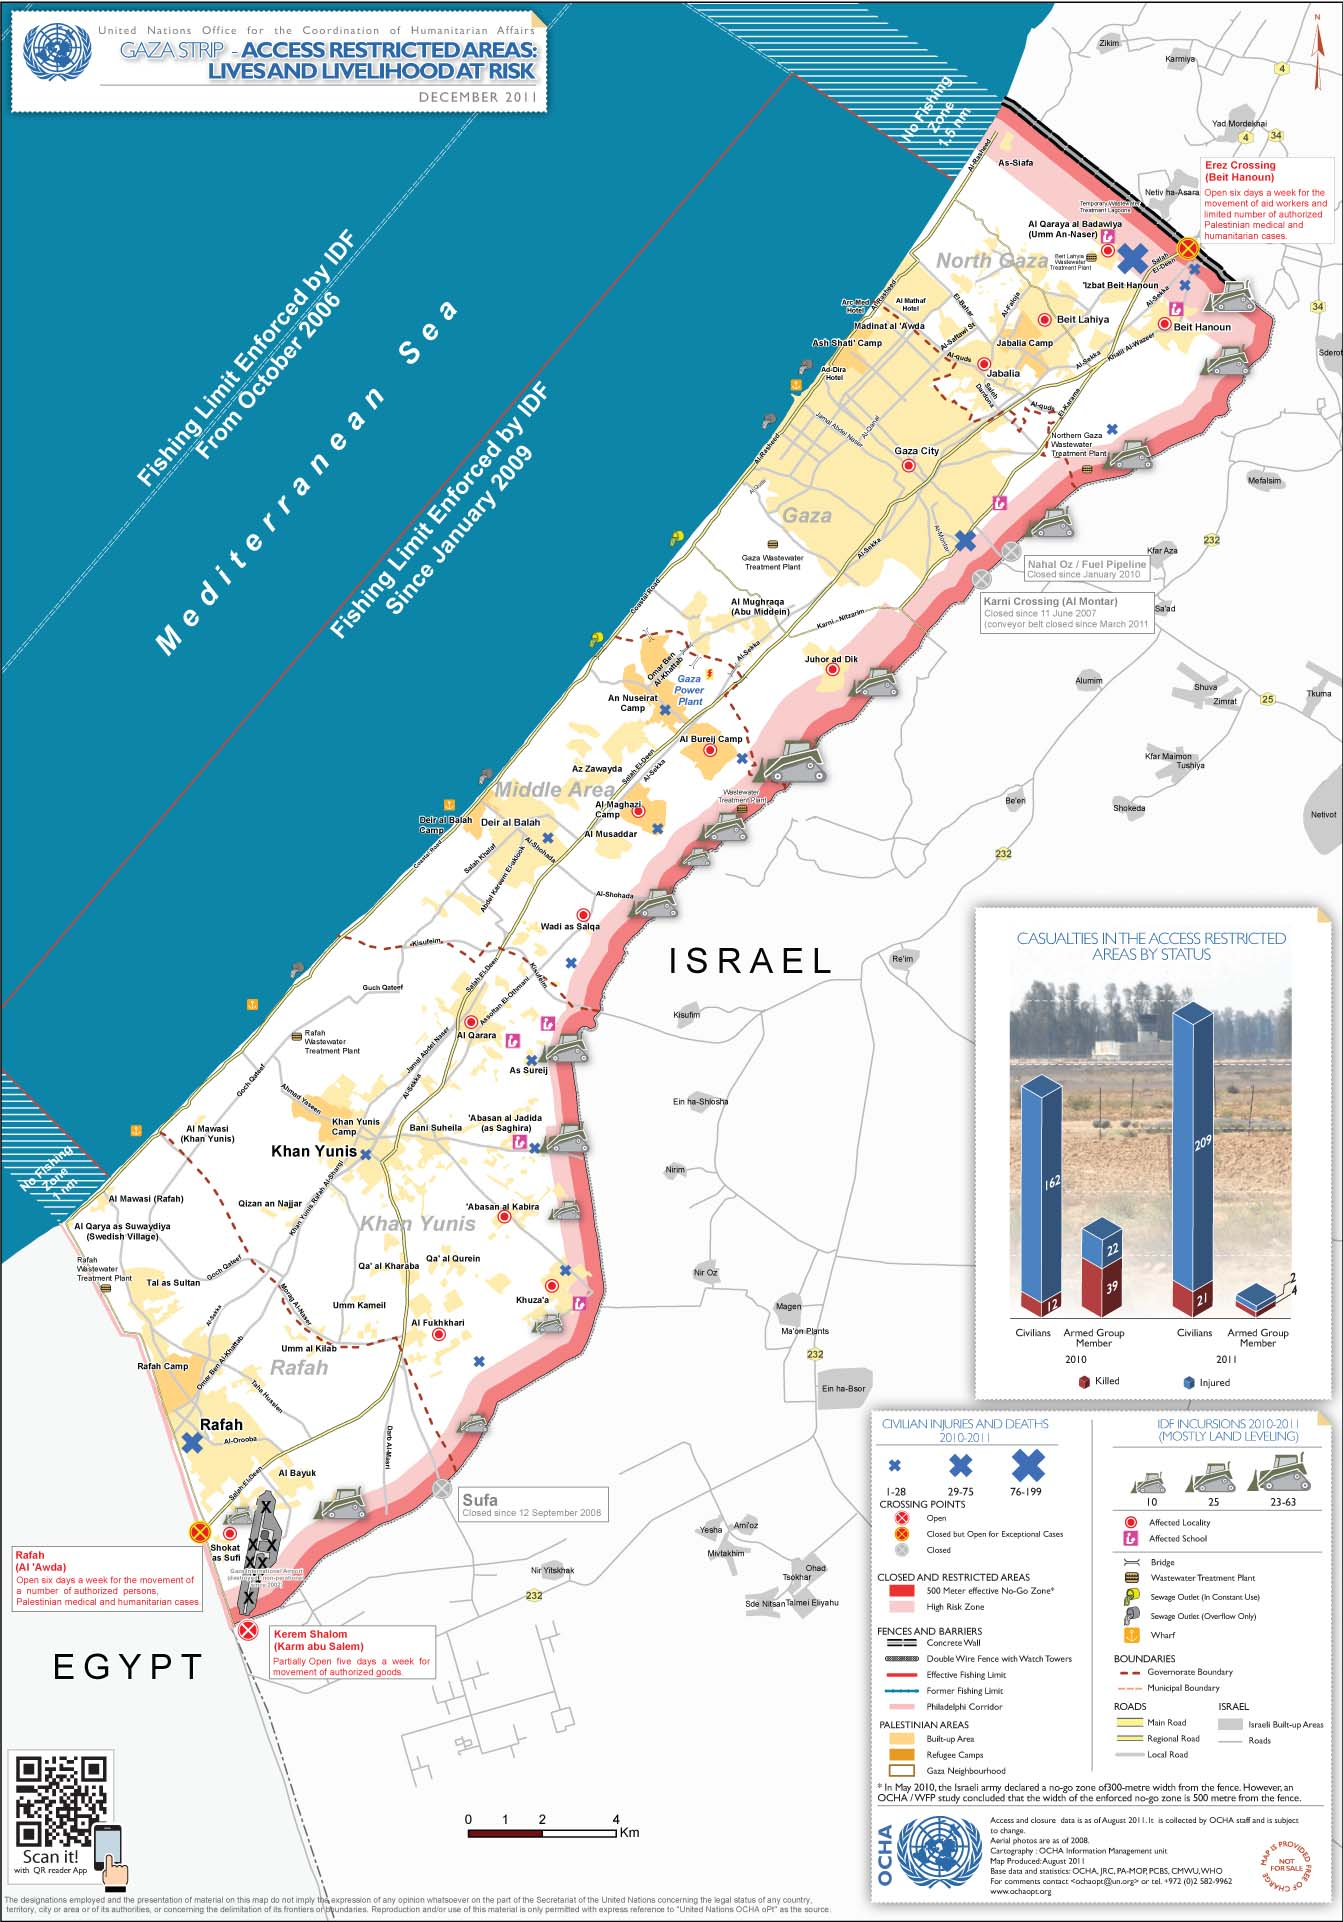 PALESTINE /// Political Geography of the Gaza Strip: A ... on jerusalem to gaza map, israel west bank map, west bank and gaza map, 2014 israel map, gaza strip map, israel gaza strip,